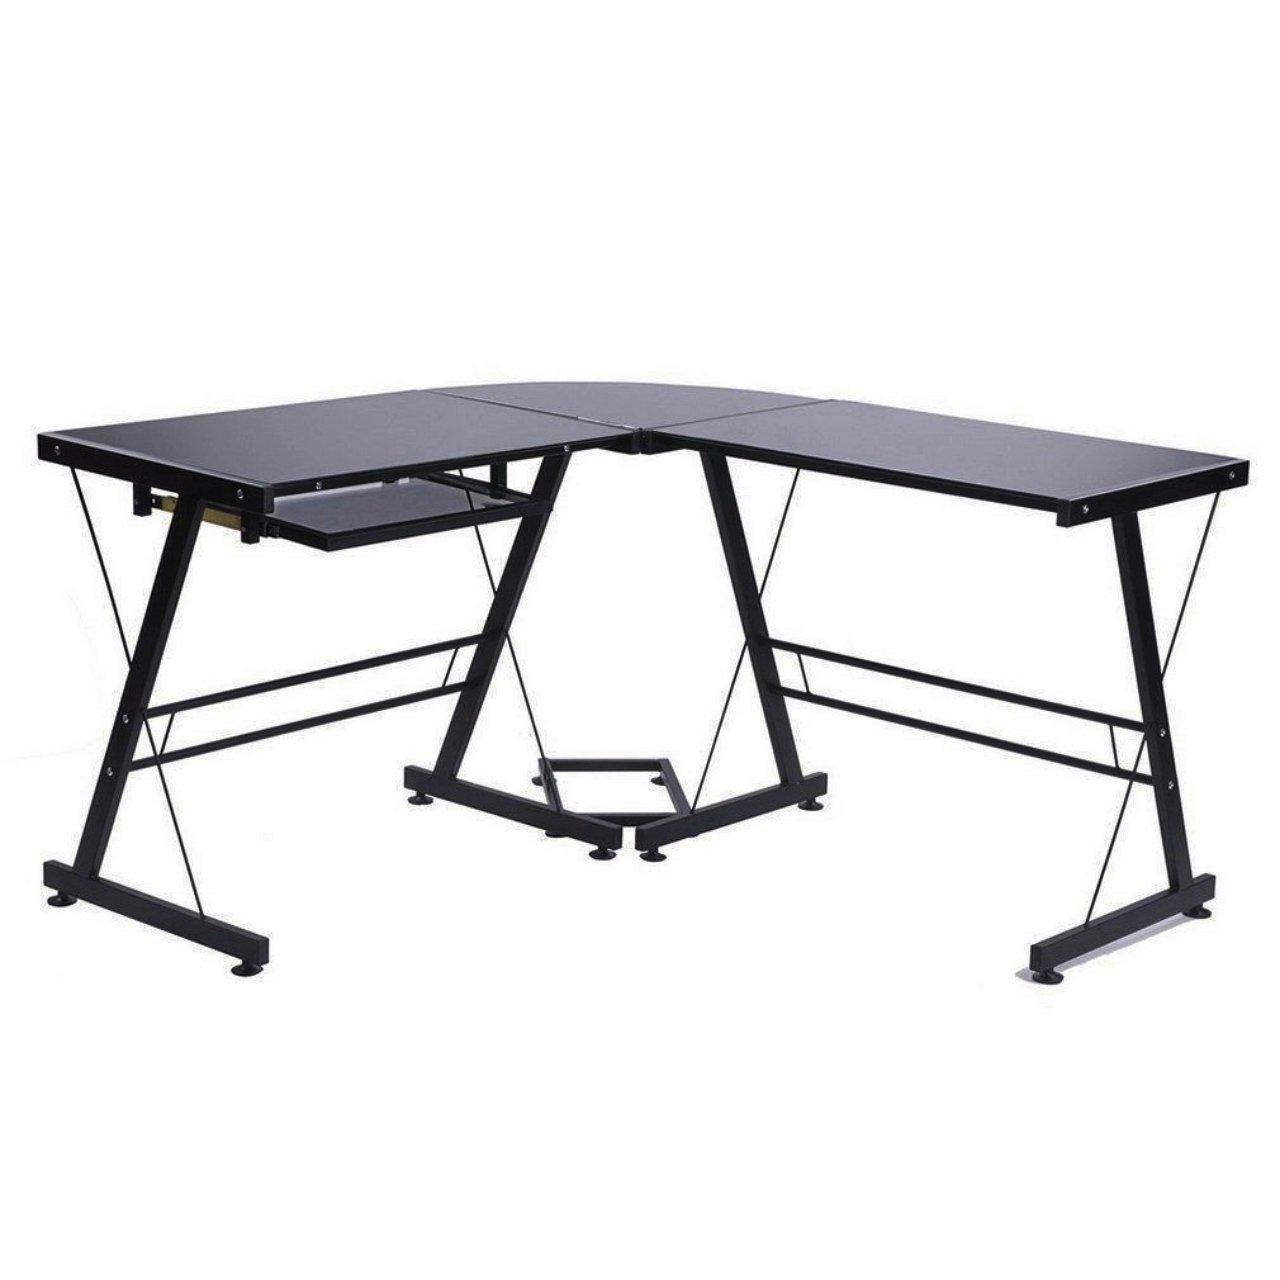 New Solid Stalinite Glass Top Computer Corner Desk PC Laptop Workstation Table Home Office Furniture/ Black #1044 by Koonlert@shop